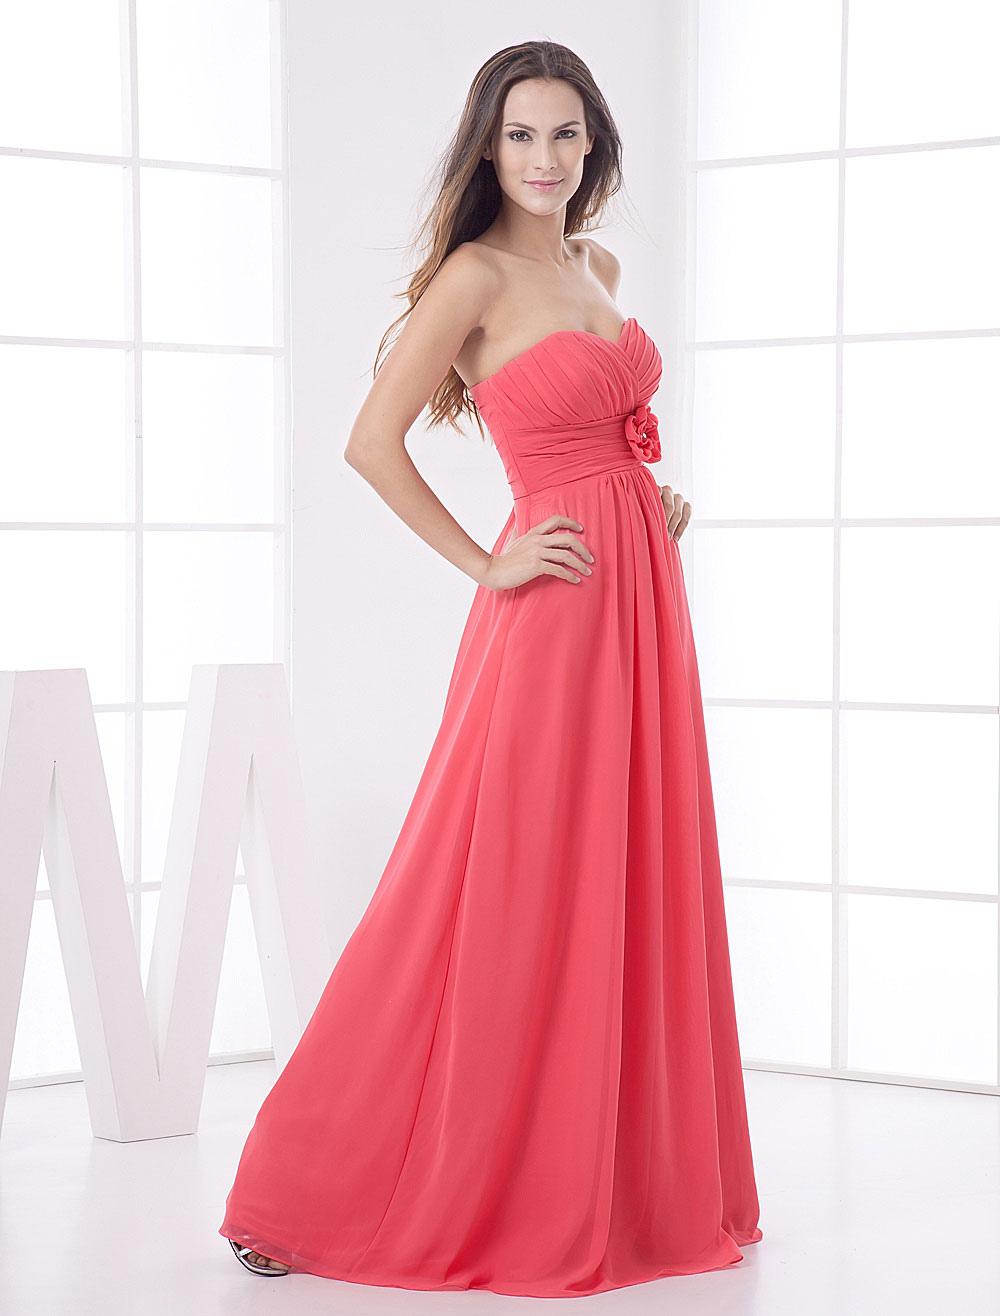 Strapless Bridesmaid Dress Coral Floor Length Flower Chiffon Maxi Prom Dress